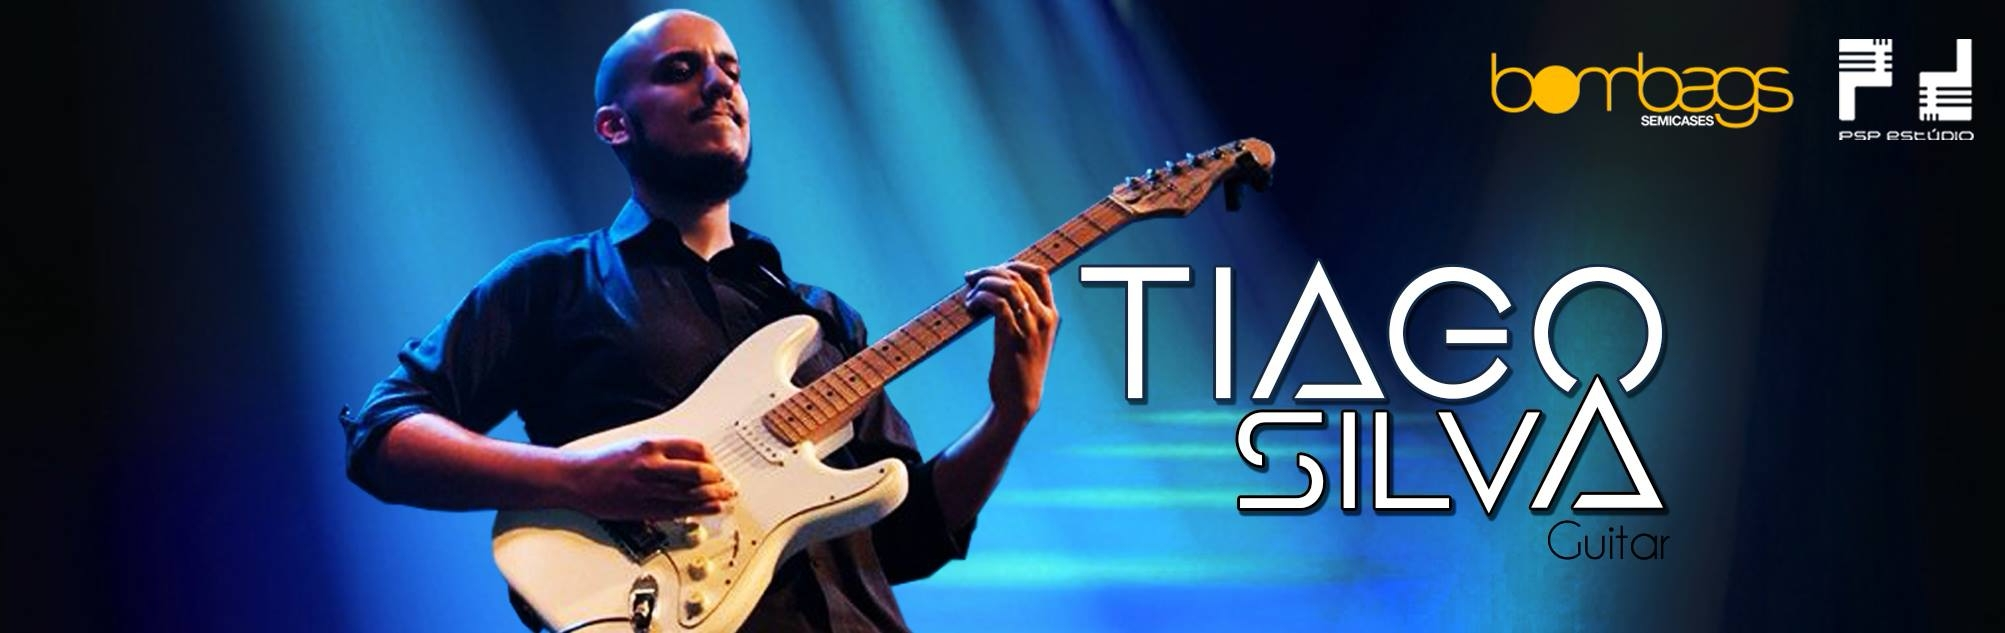 Tiago Silva (@tiagosilvaguitar) Cover Image